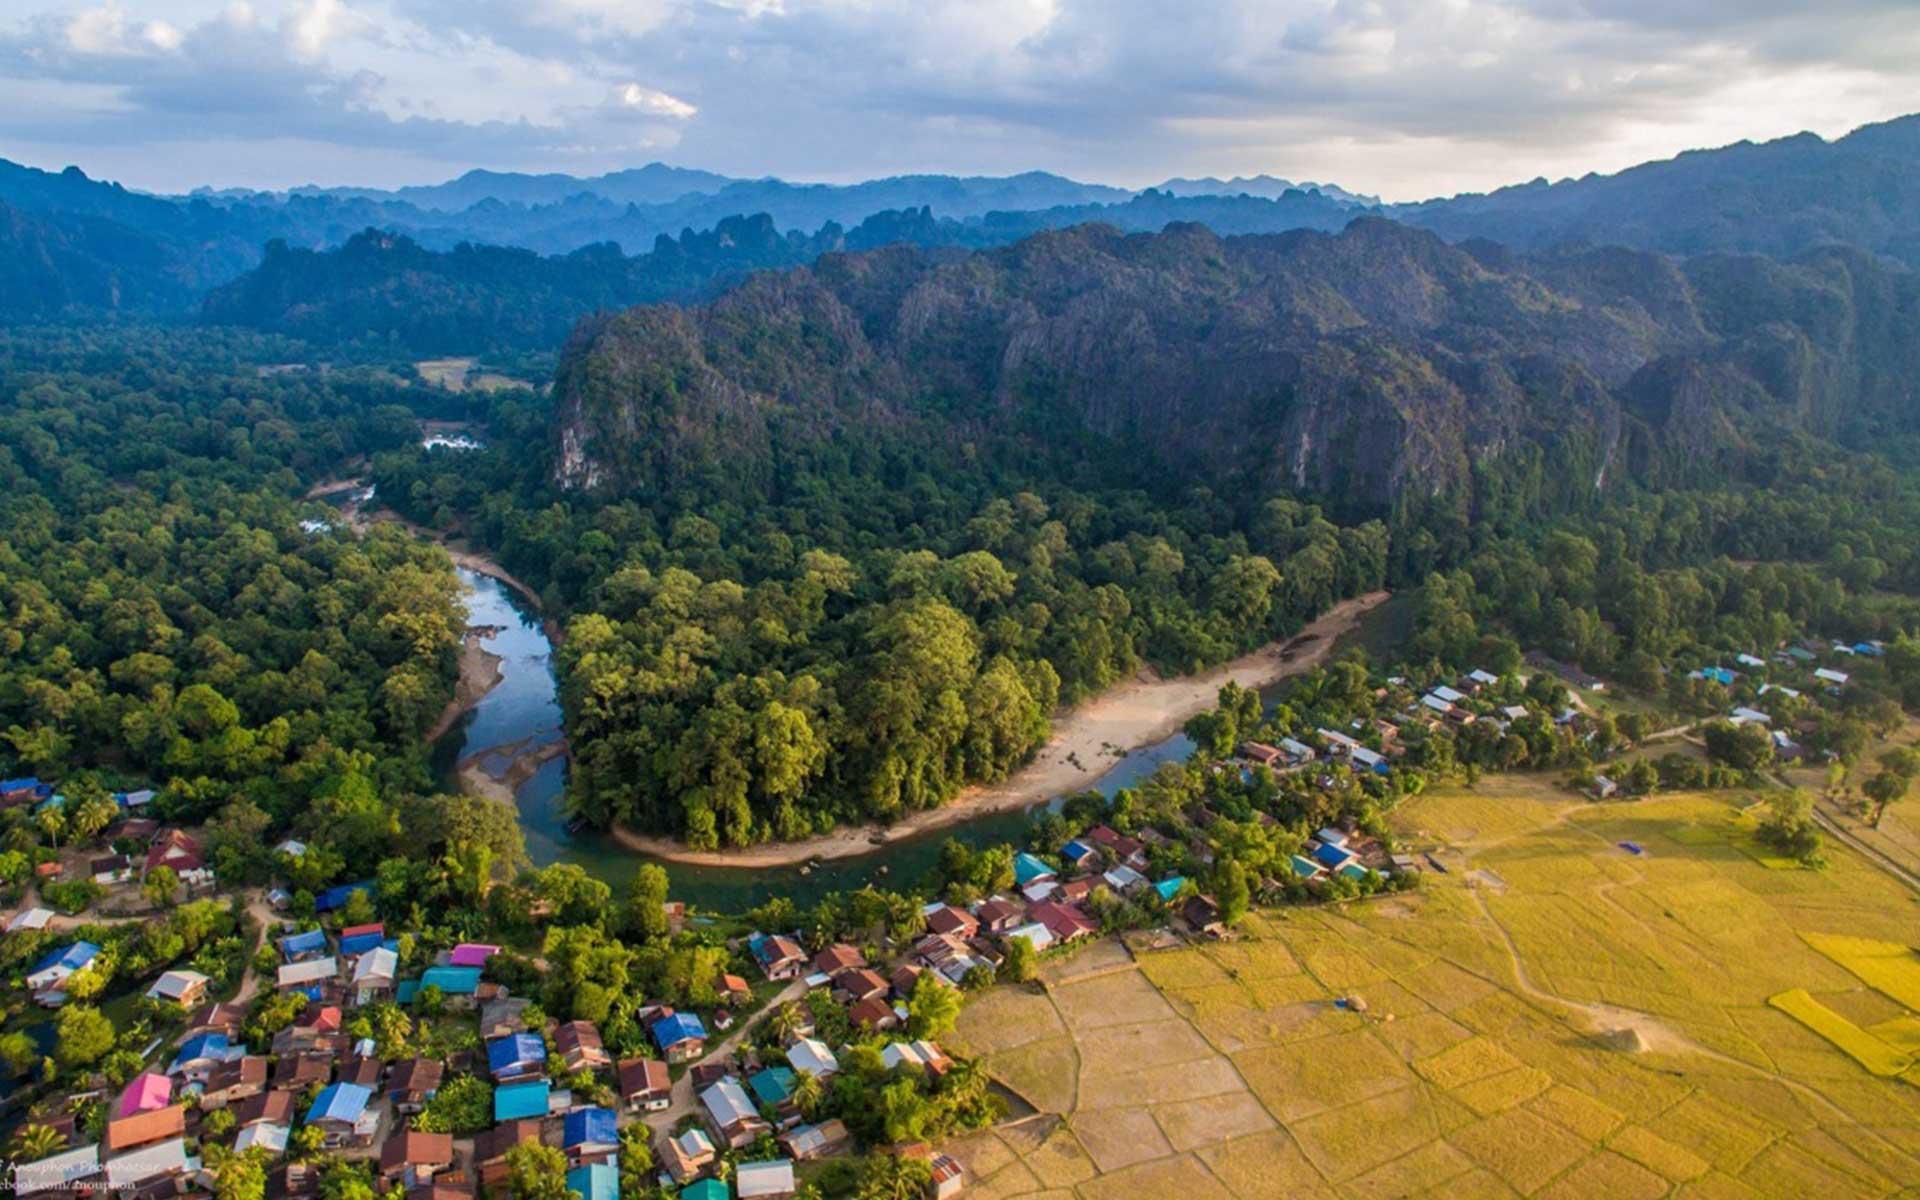 LAOS Laotravel 7 Laos Travel